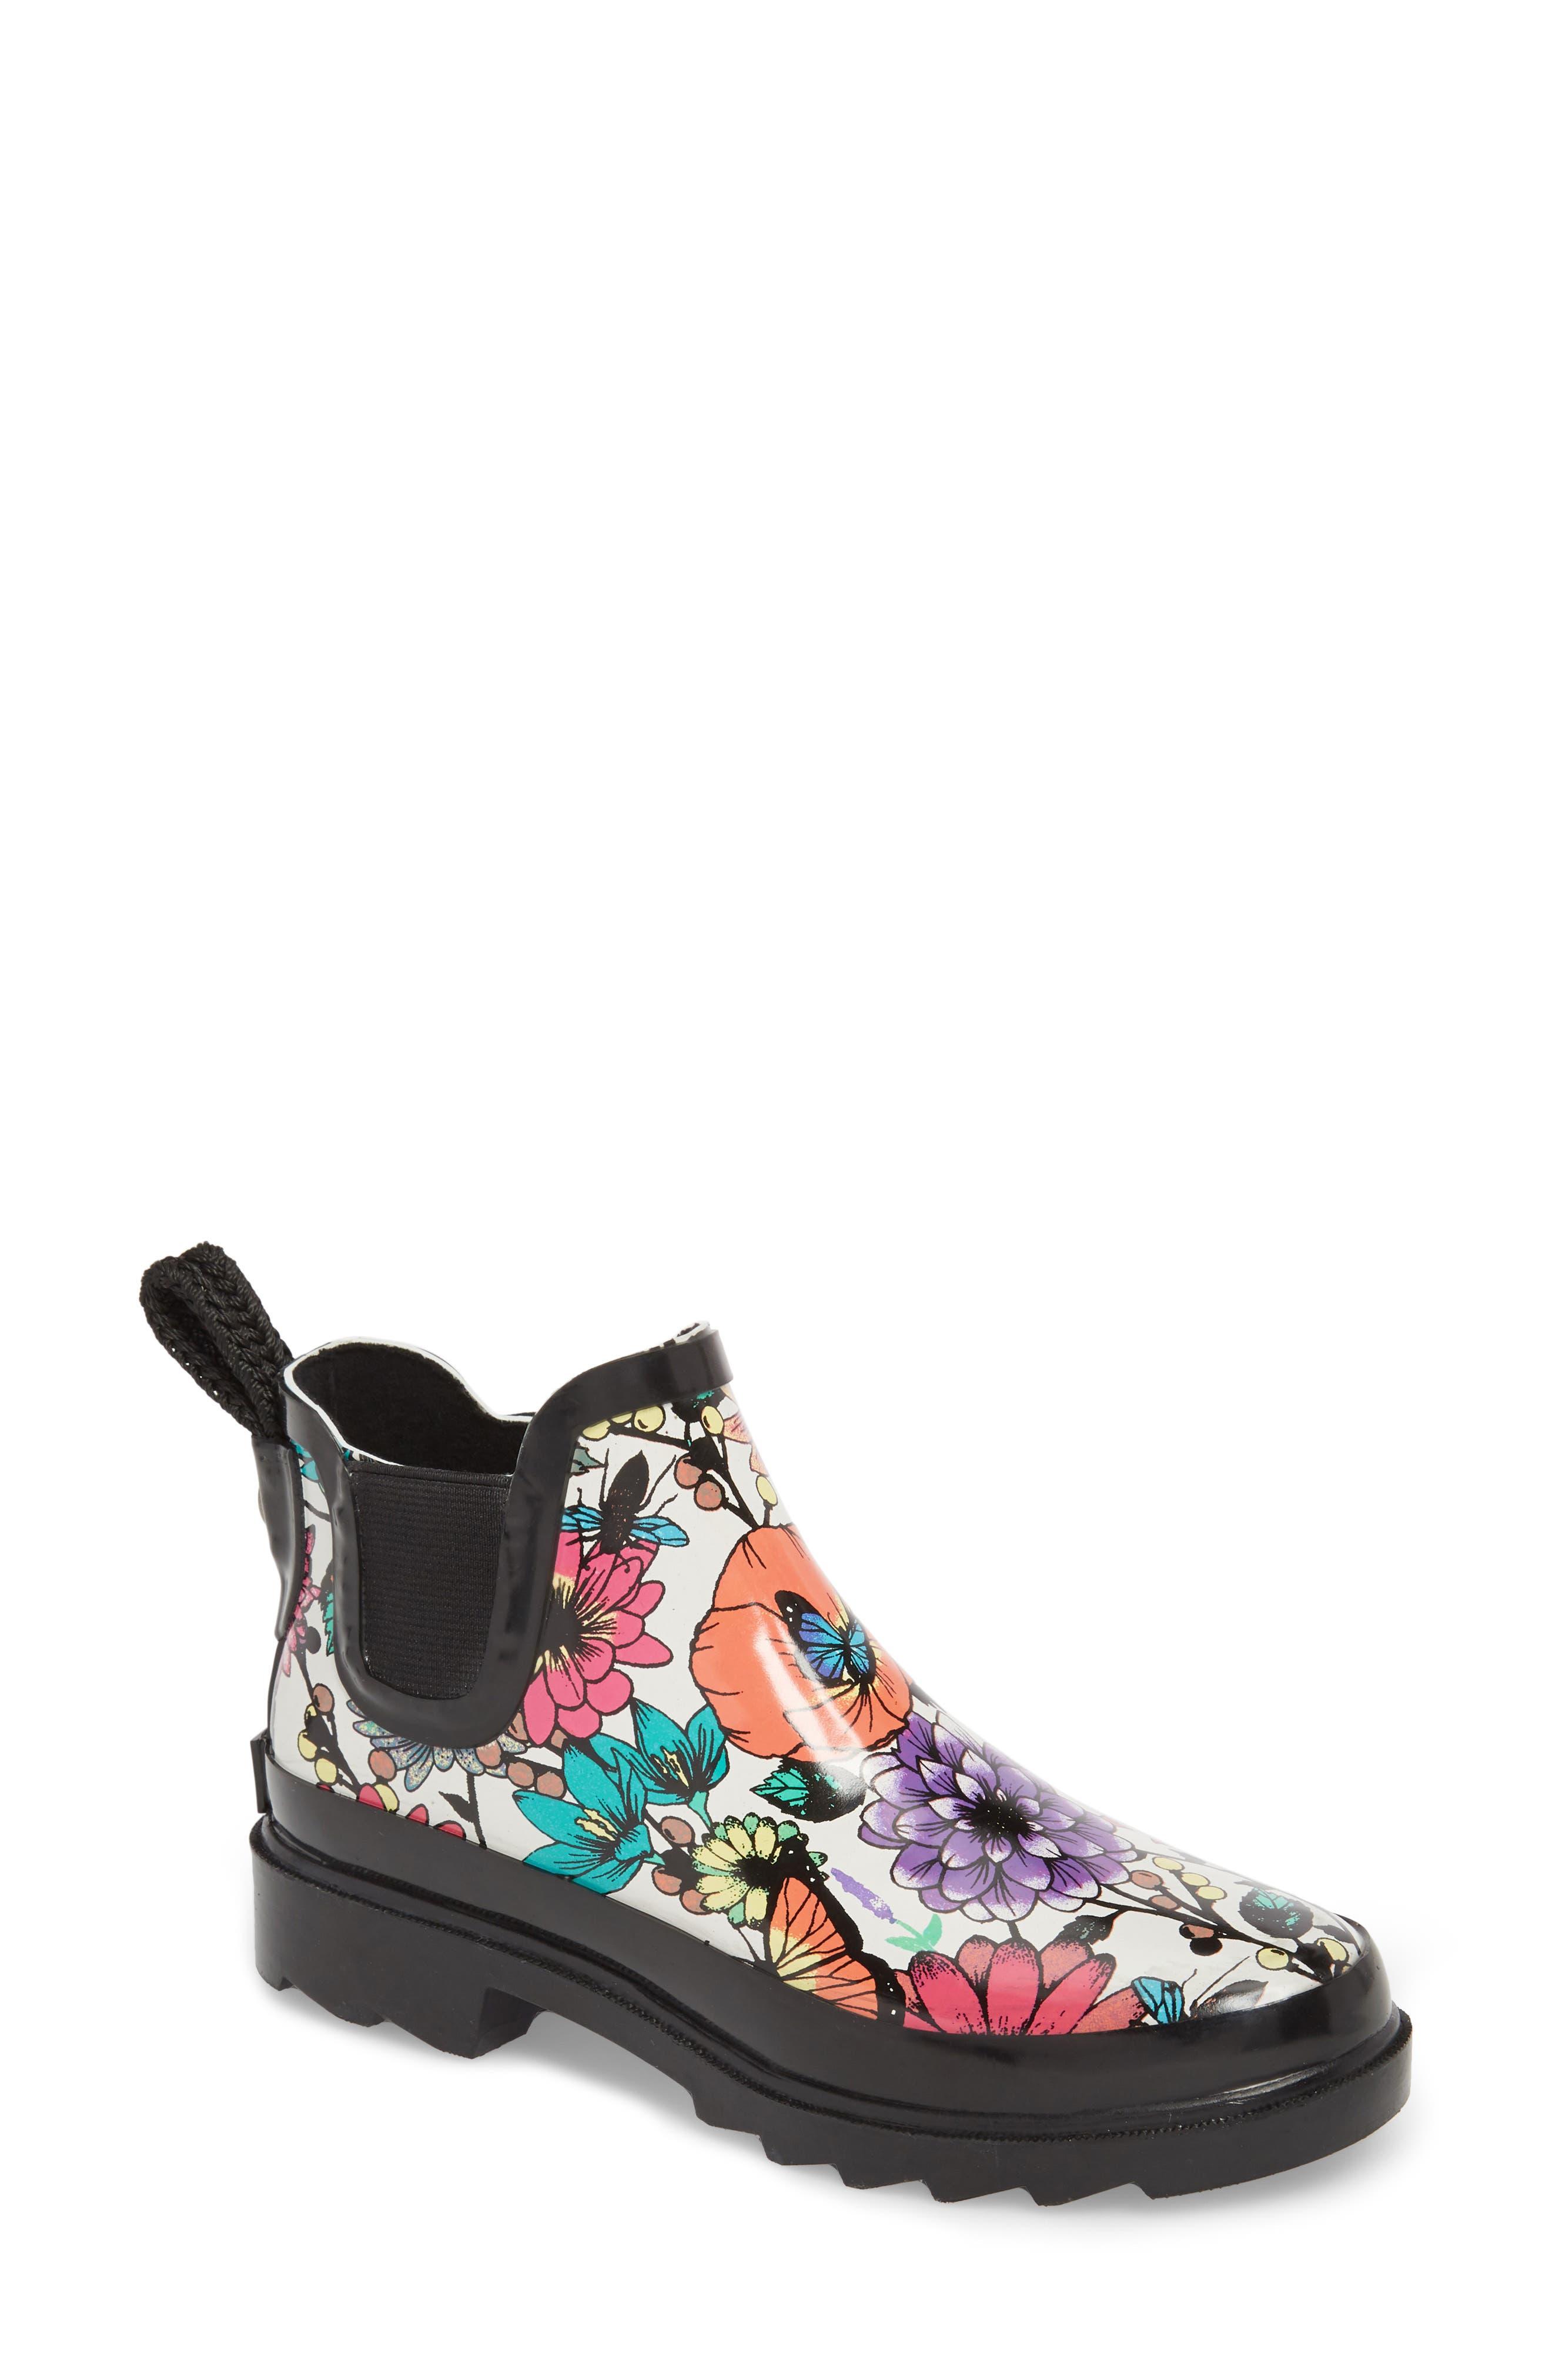 'Rhyme' Waterproof Rain Boot,                             Main thumbnail 1, color,                             Optic In Bloom